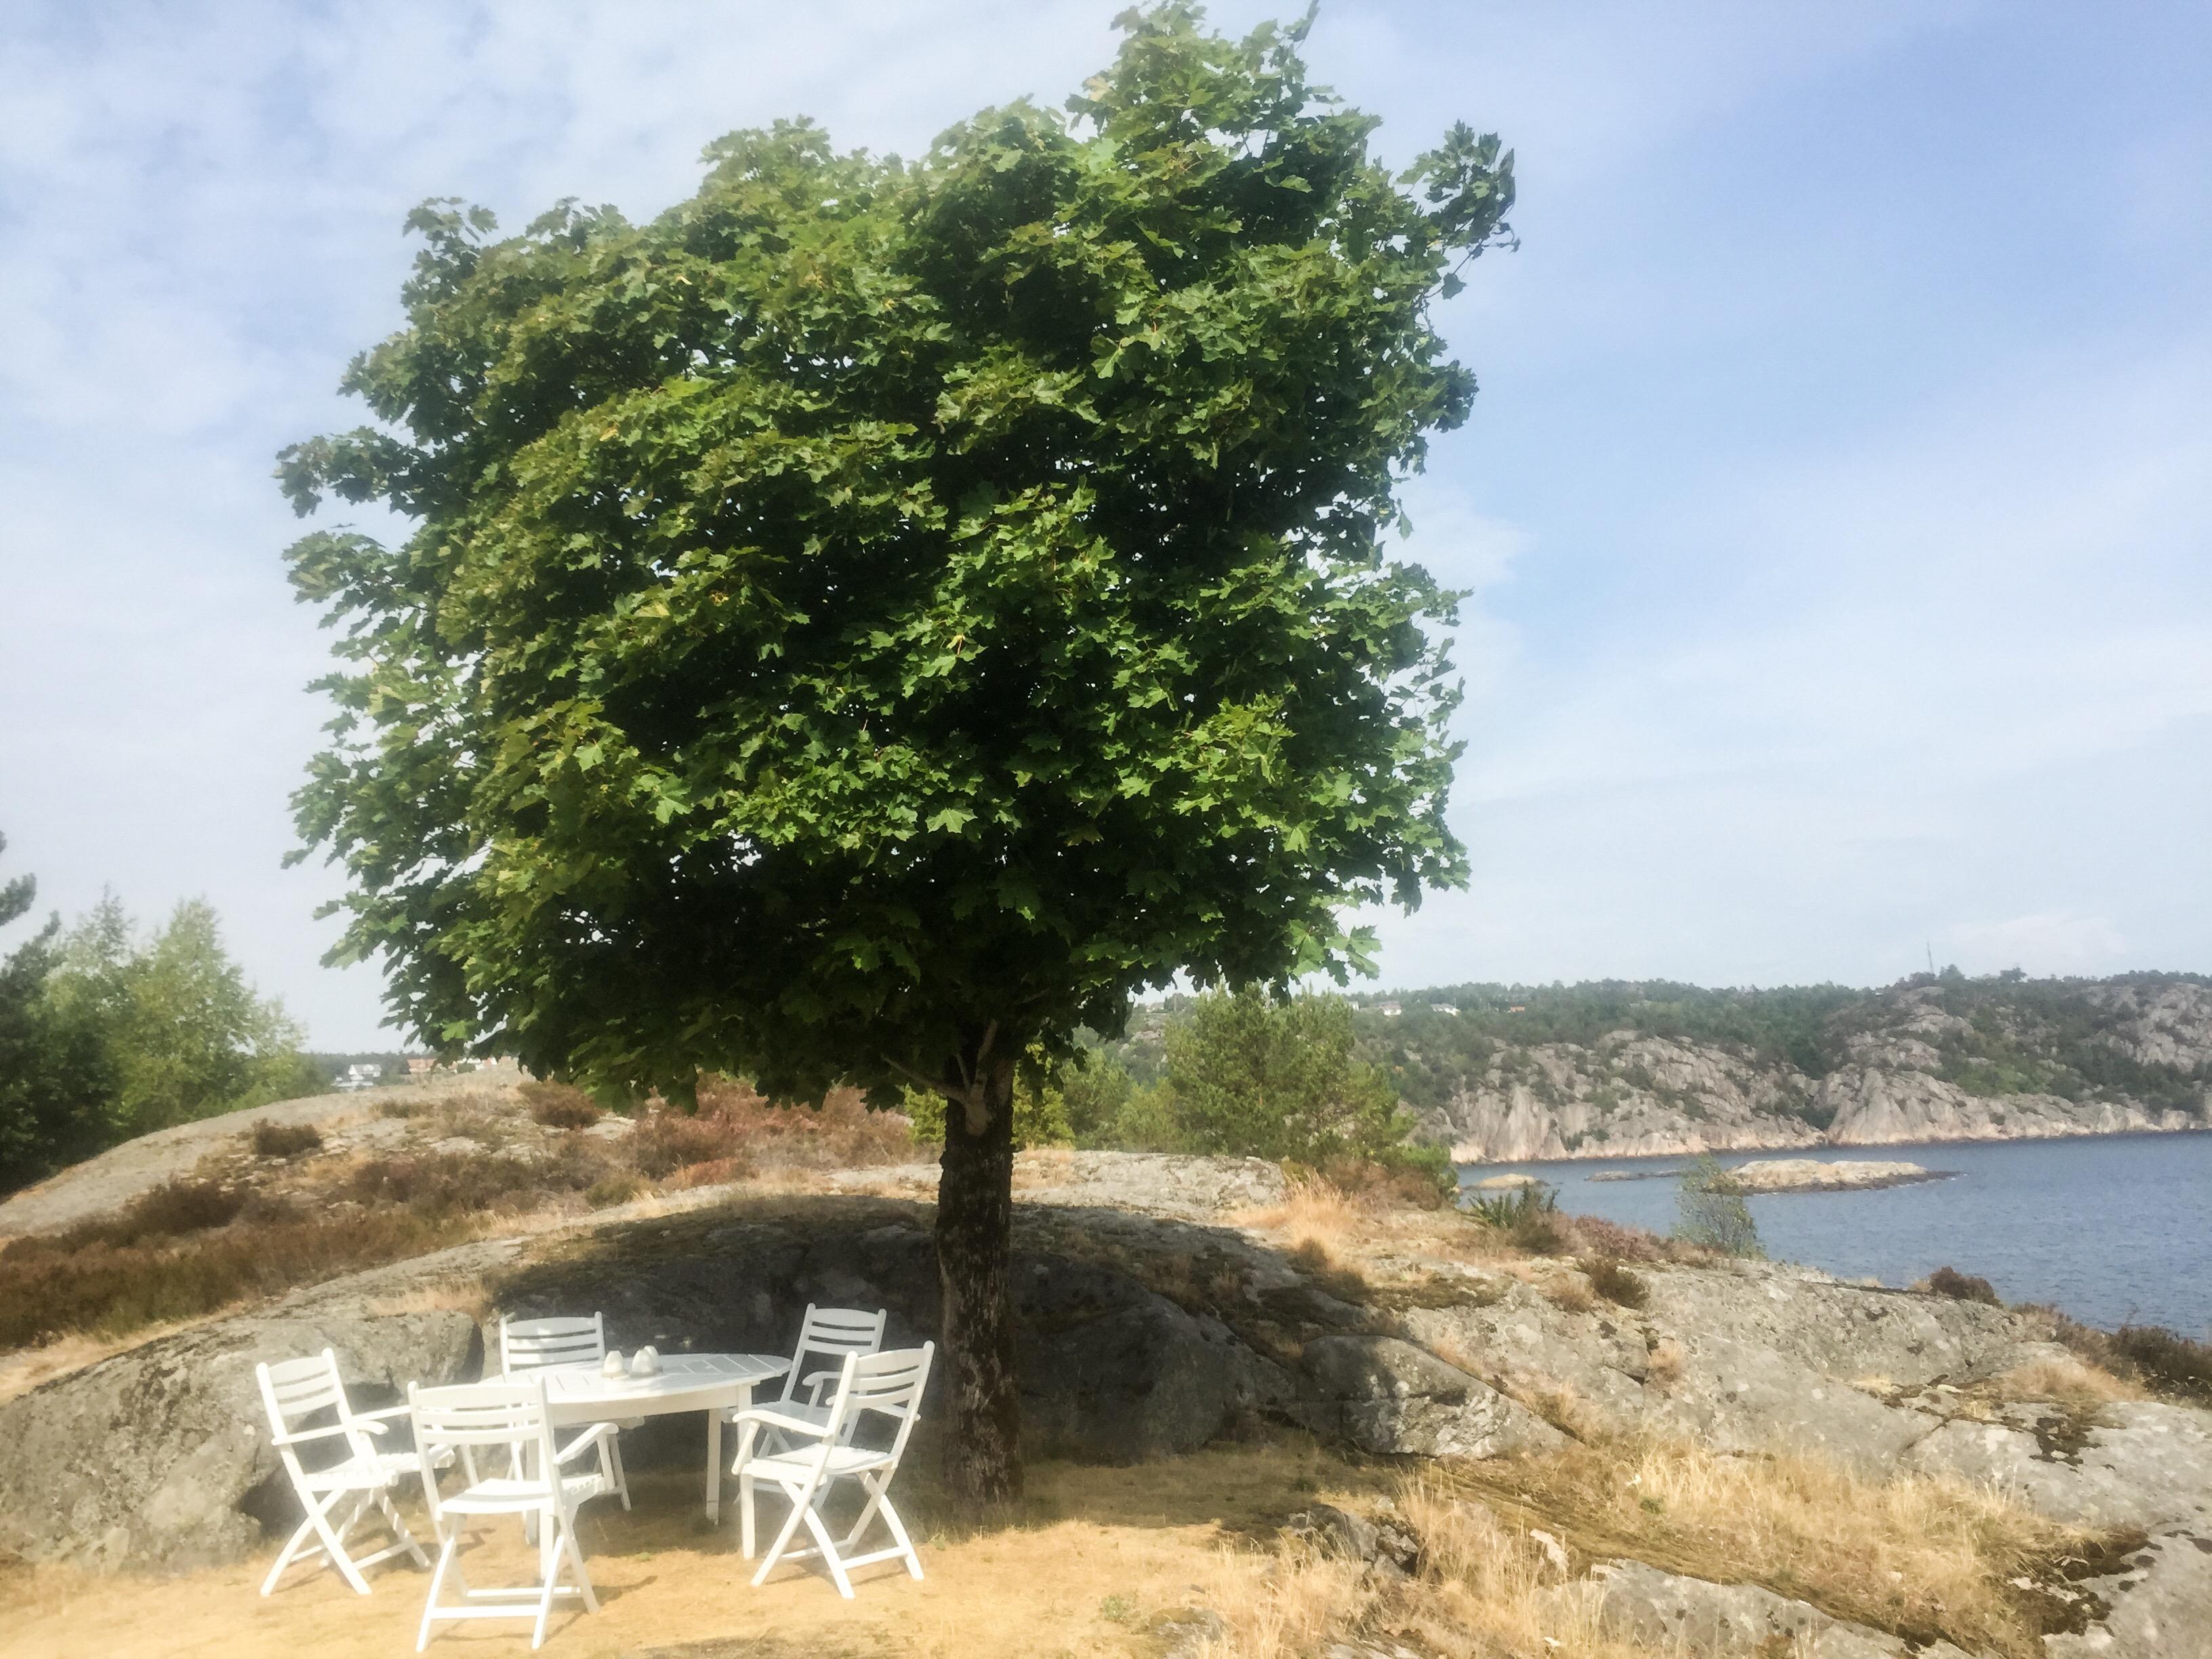 trær-natur-øy-john-donne-foto-bodil-fuhr